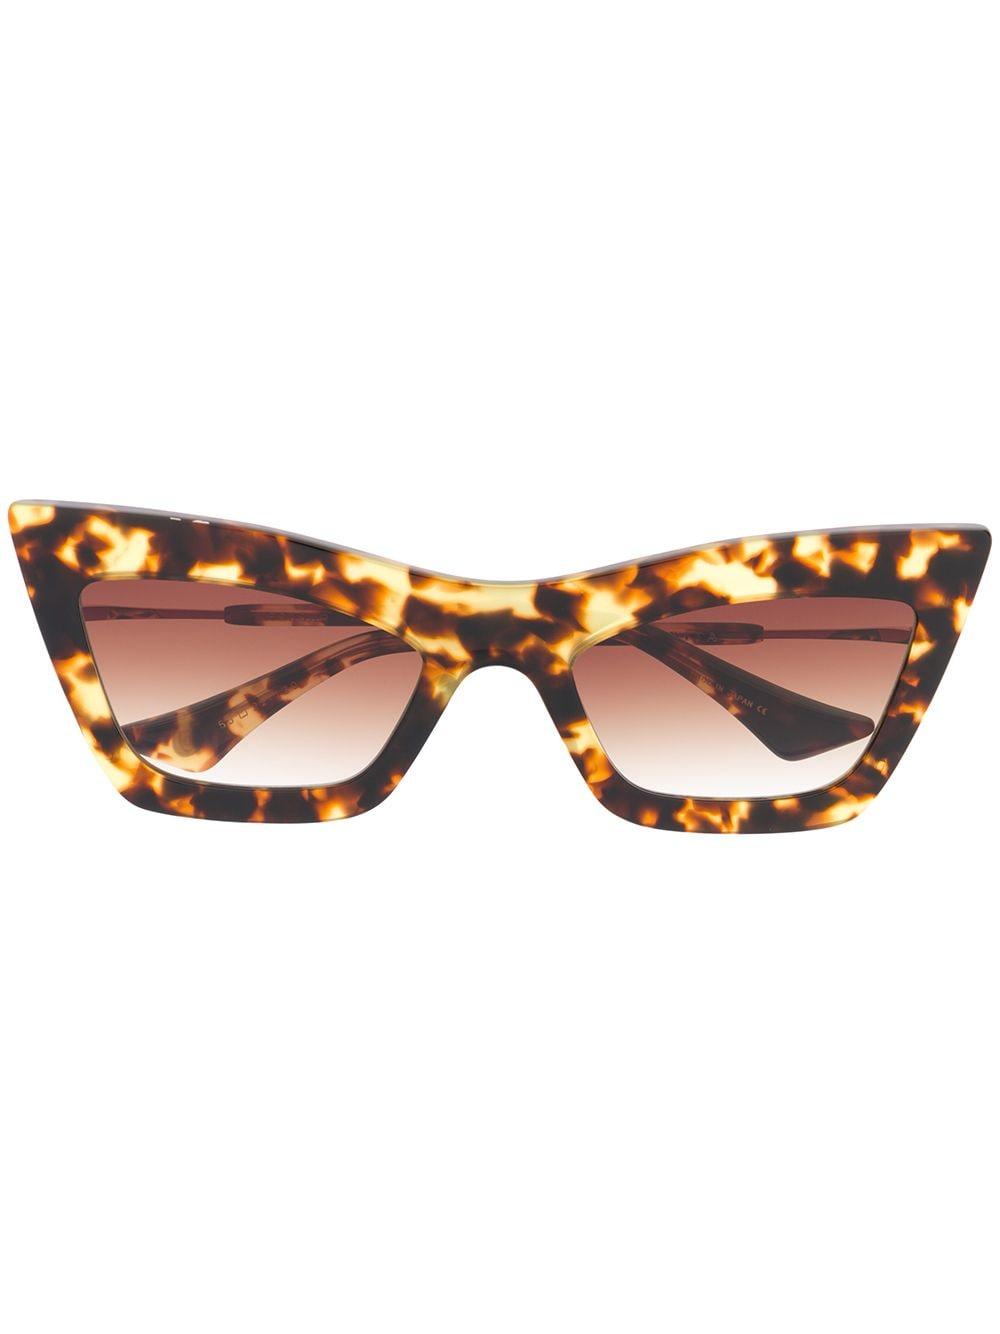 Dita Eyewear 'Erasur' Sonnenbrille - Braun